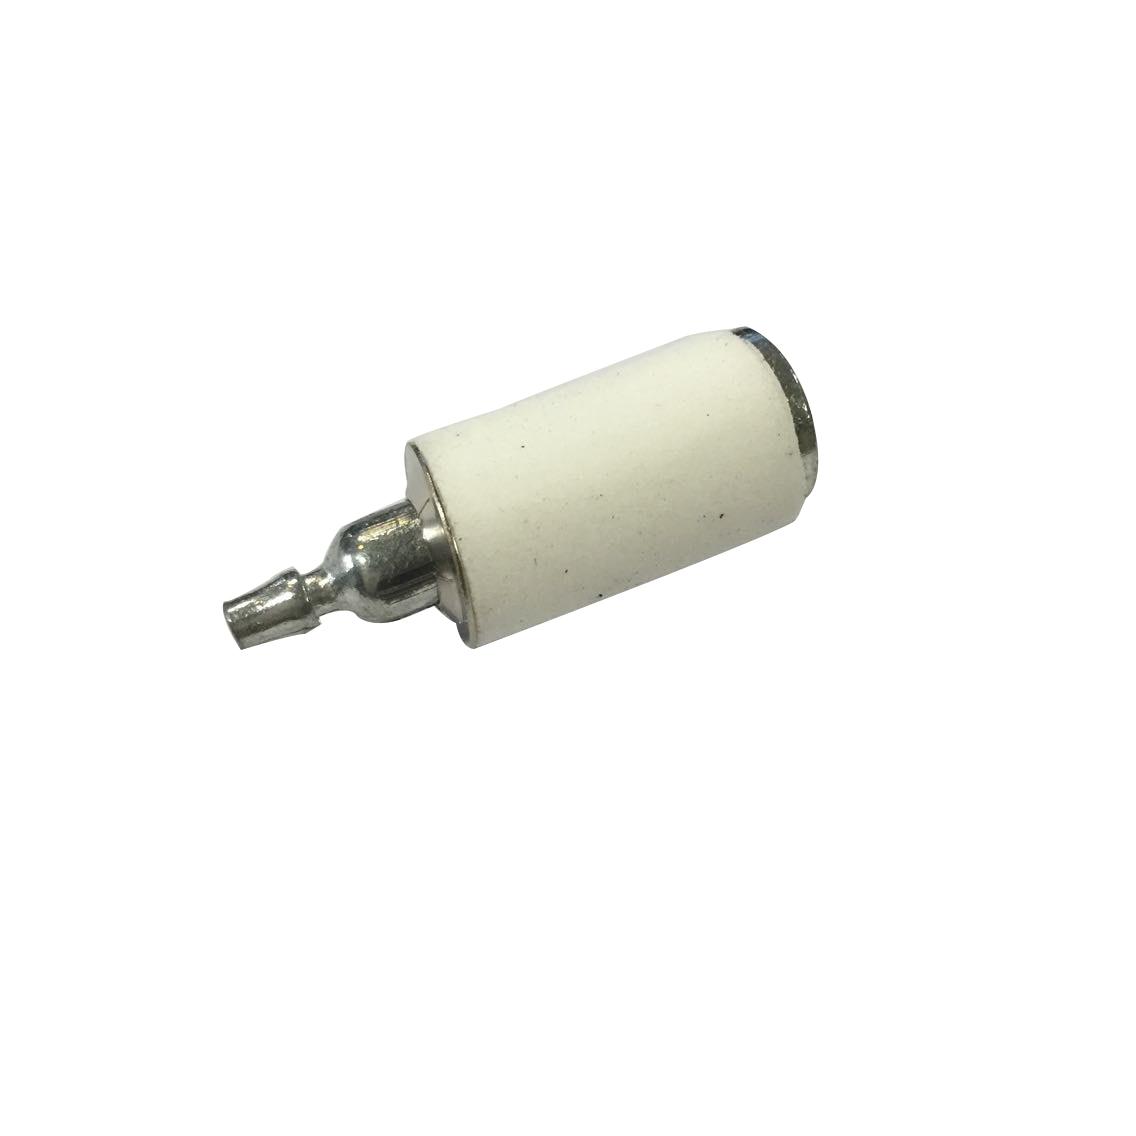 Fuel Filter 530095646 For Husqvarna 124c 124l 125c 125e 125l 125ld